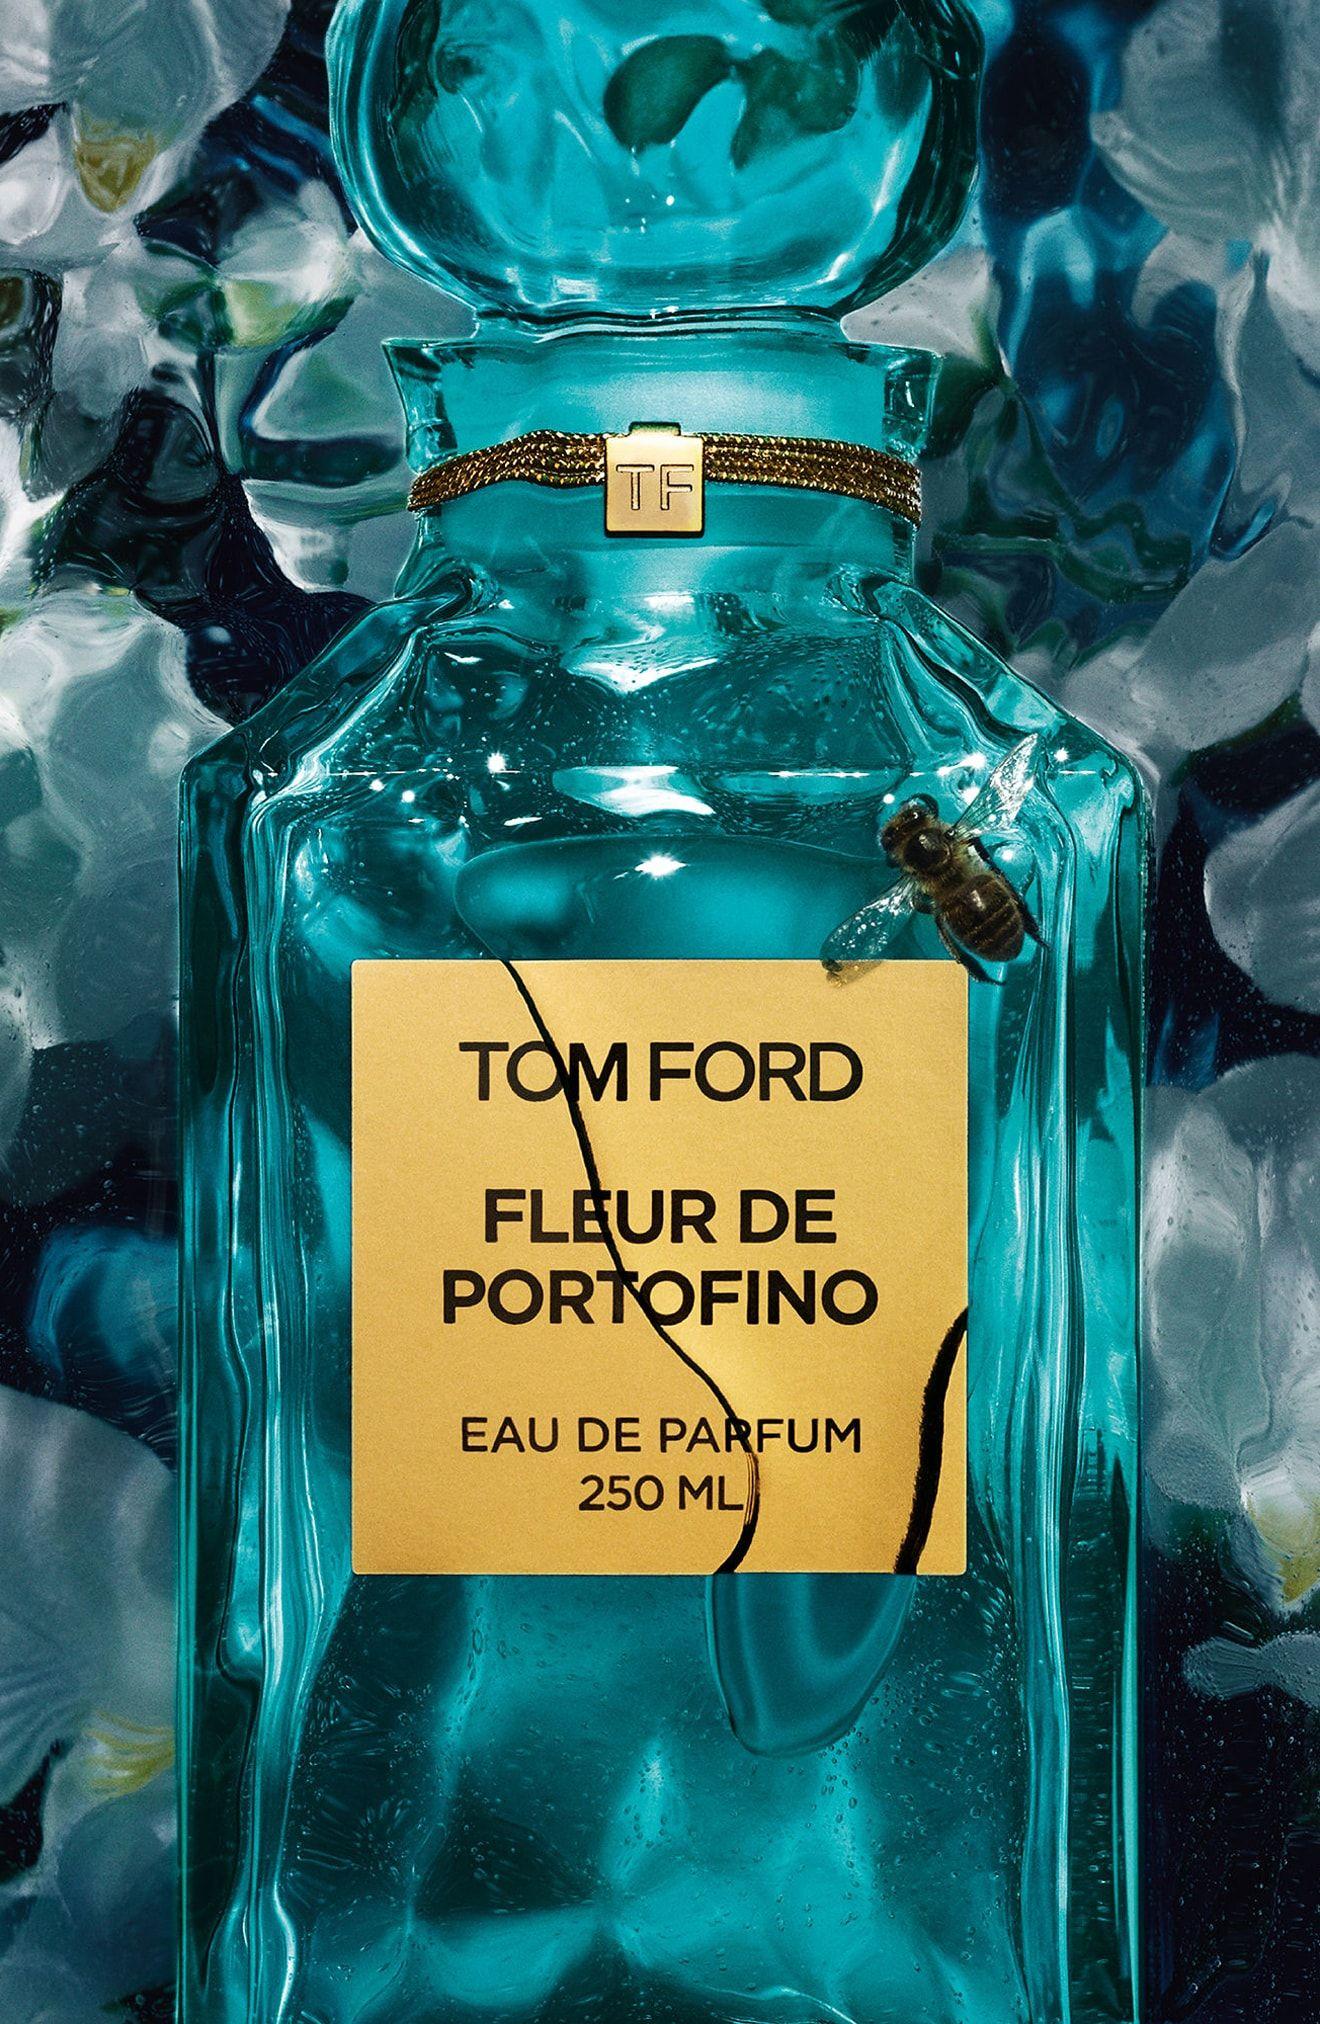 6f9f4b02573a Tom Ford Private Blend Neroli Portofino Eau de Parfum